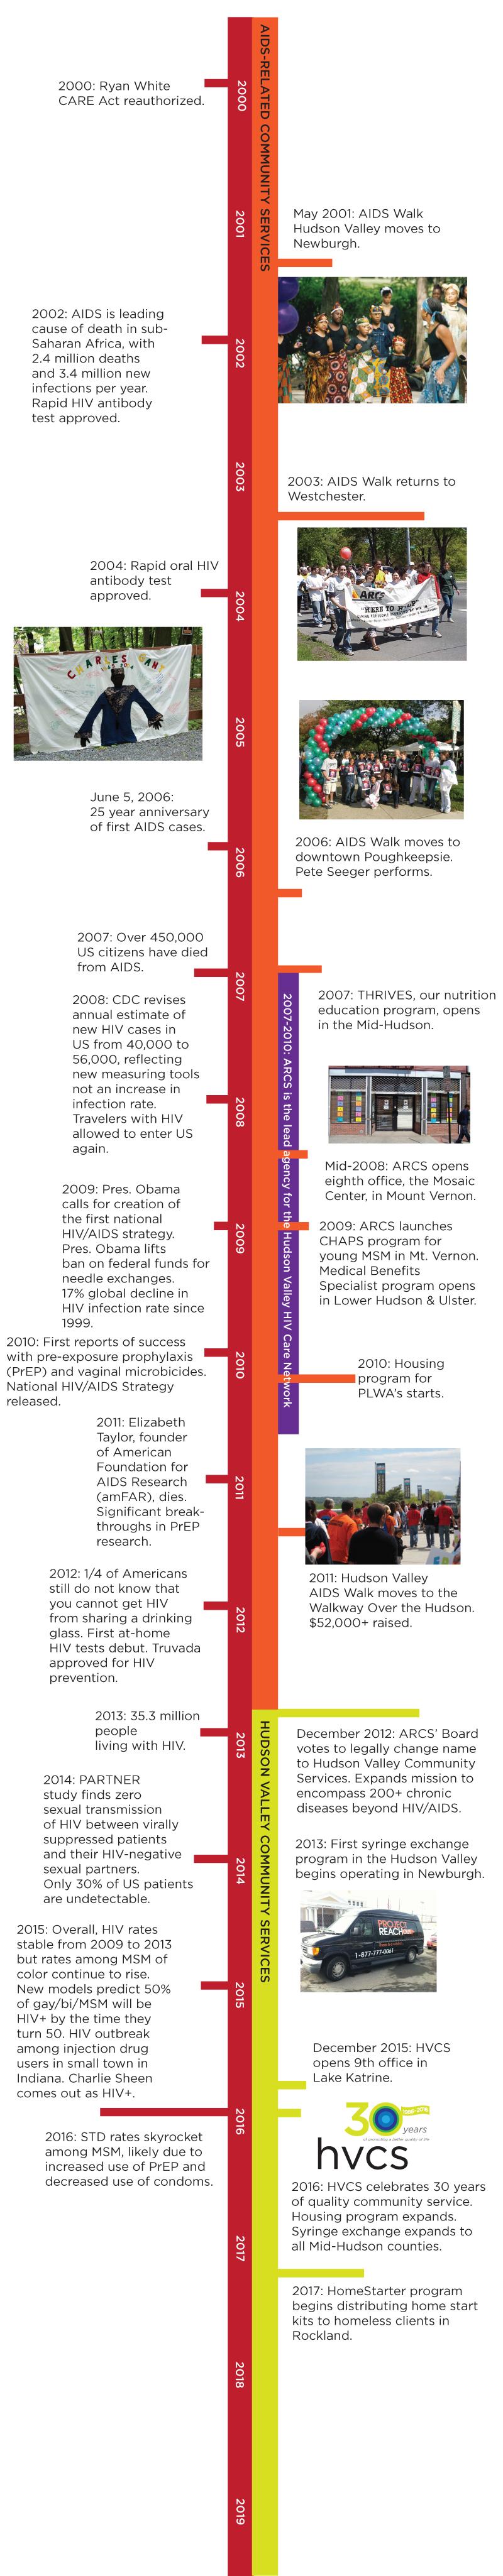 HVCS history, part 2